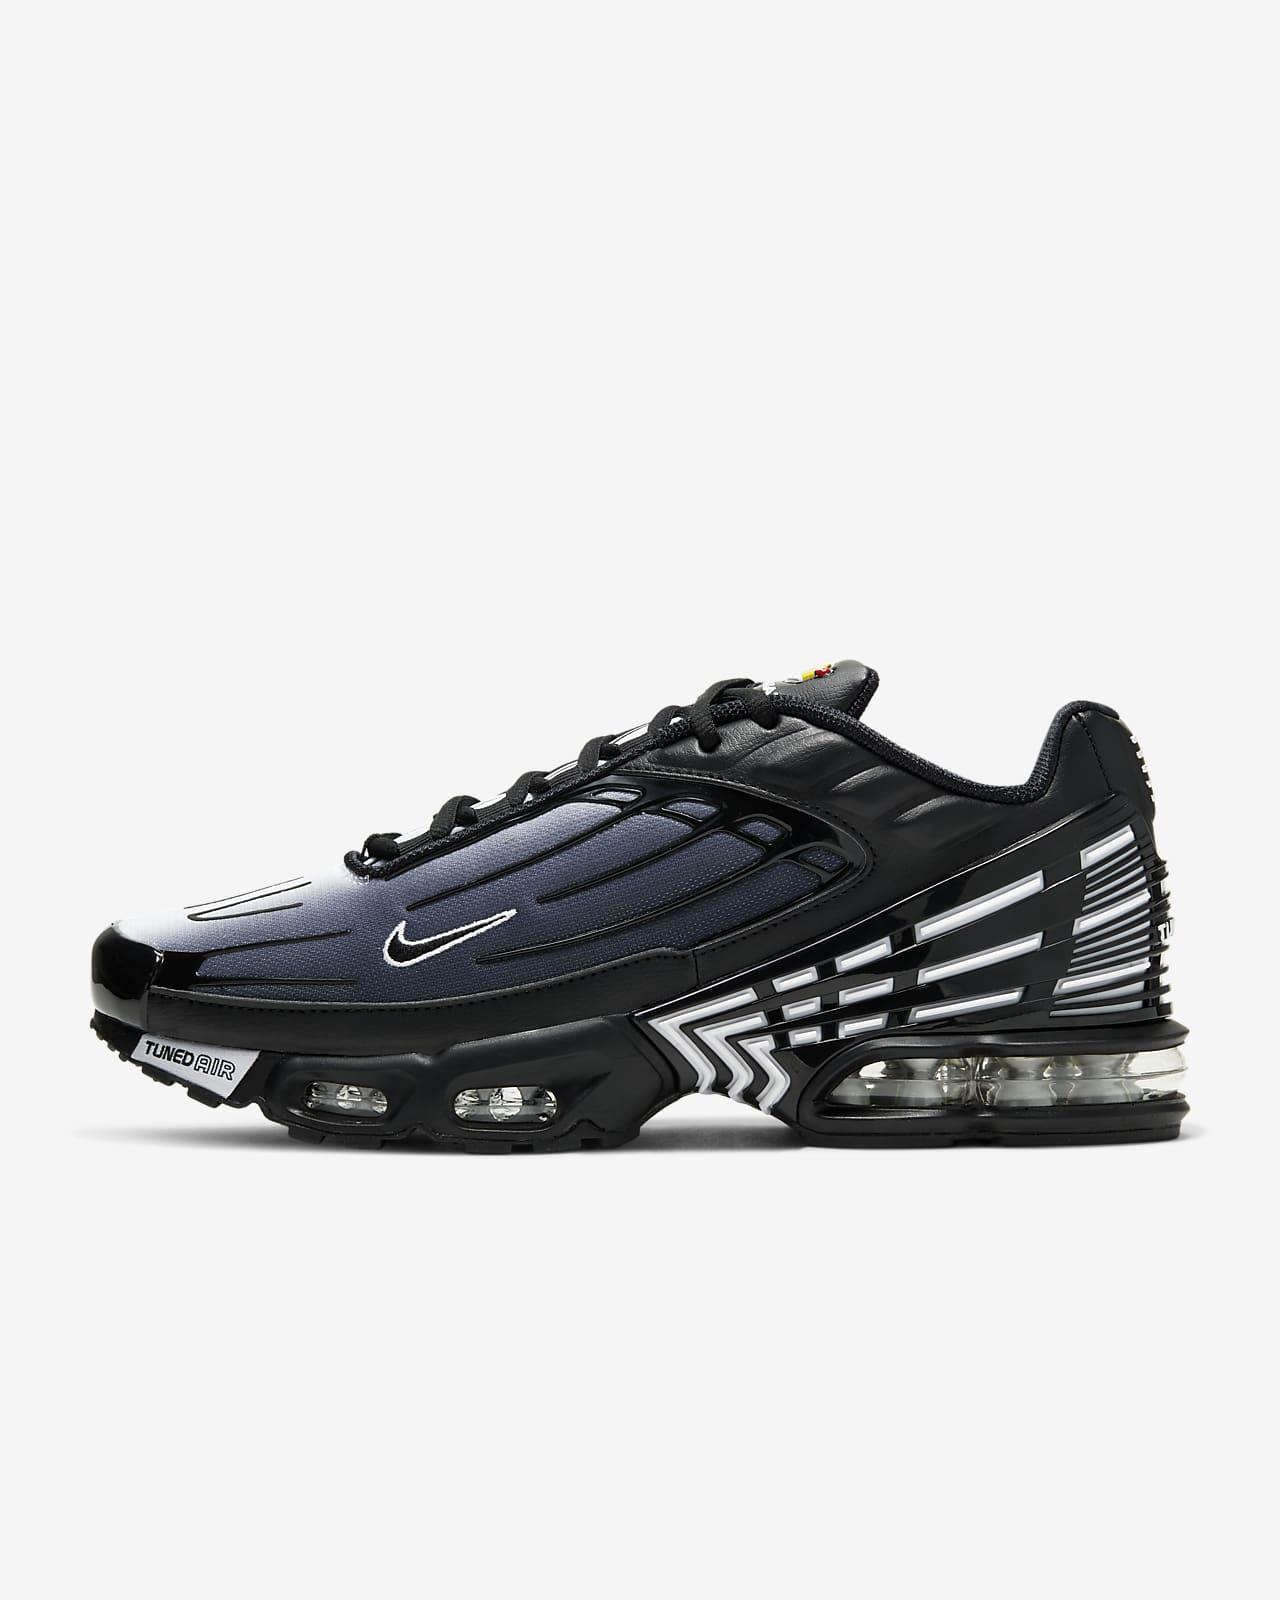 Nike Air Max Plus III Men's Shoes. Nike ZA